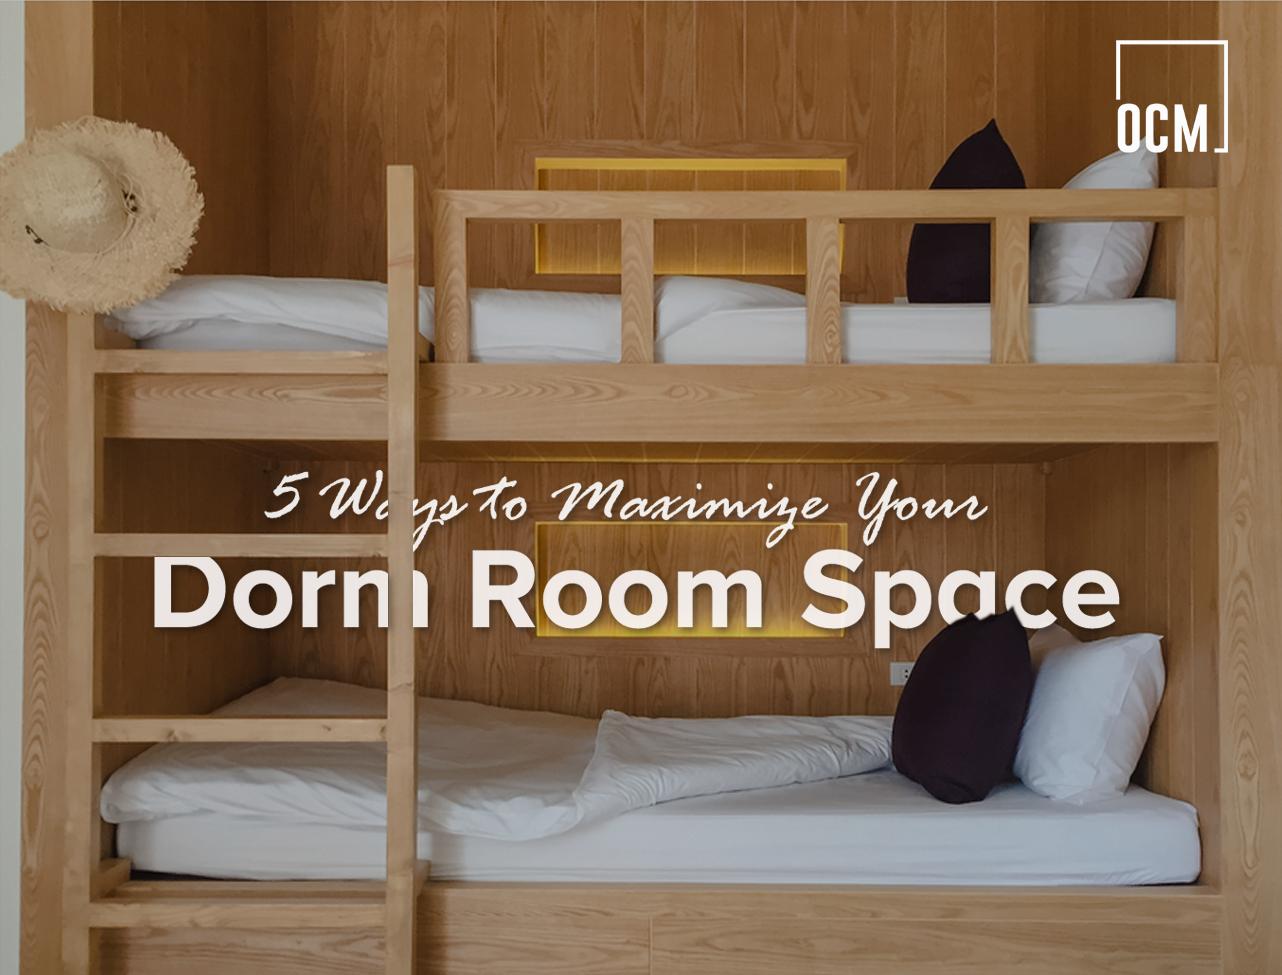 Maximize Your Dorm Room Space